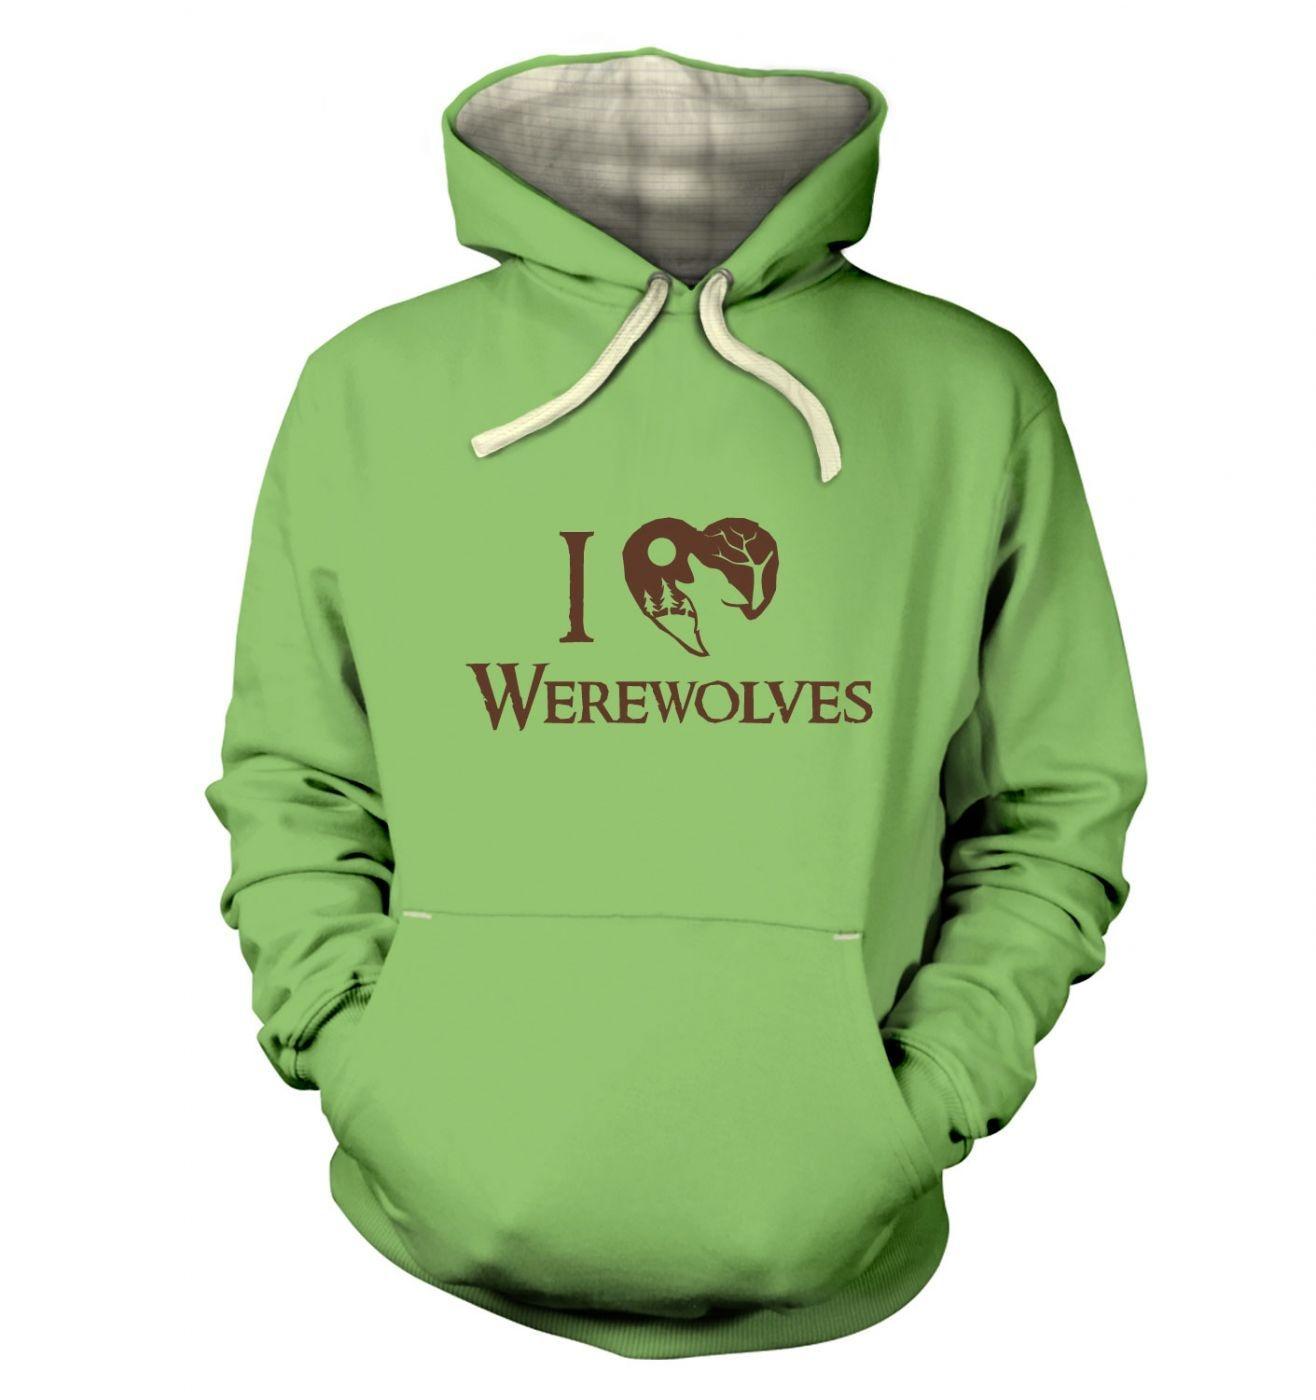 I Heart Werewolves premium hoodie